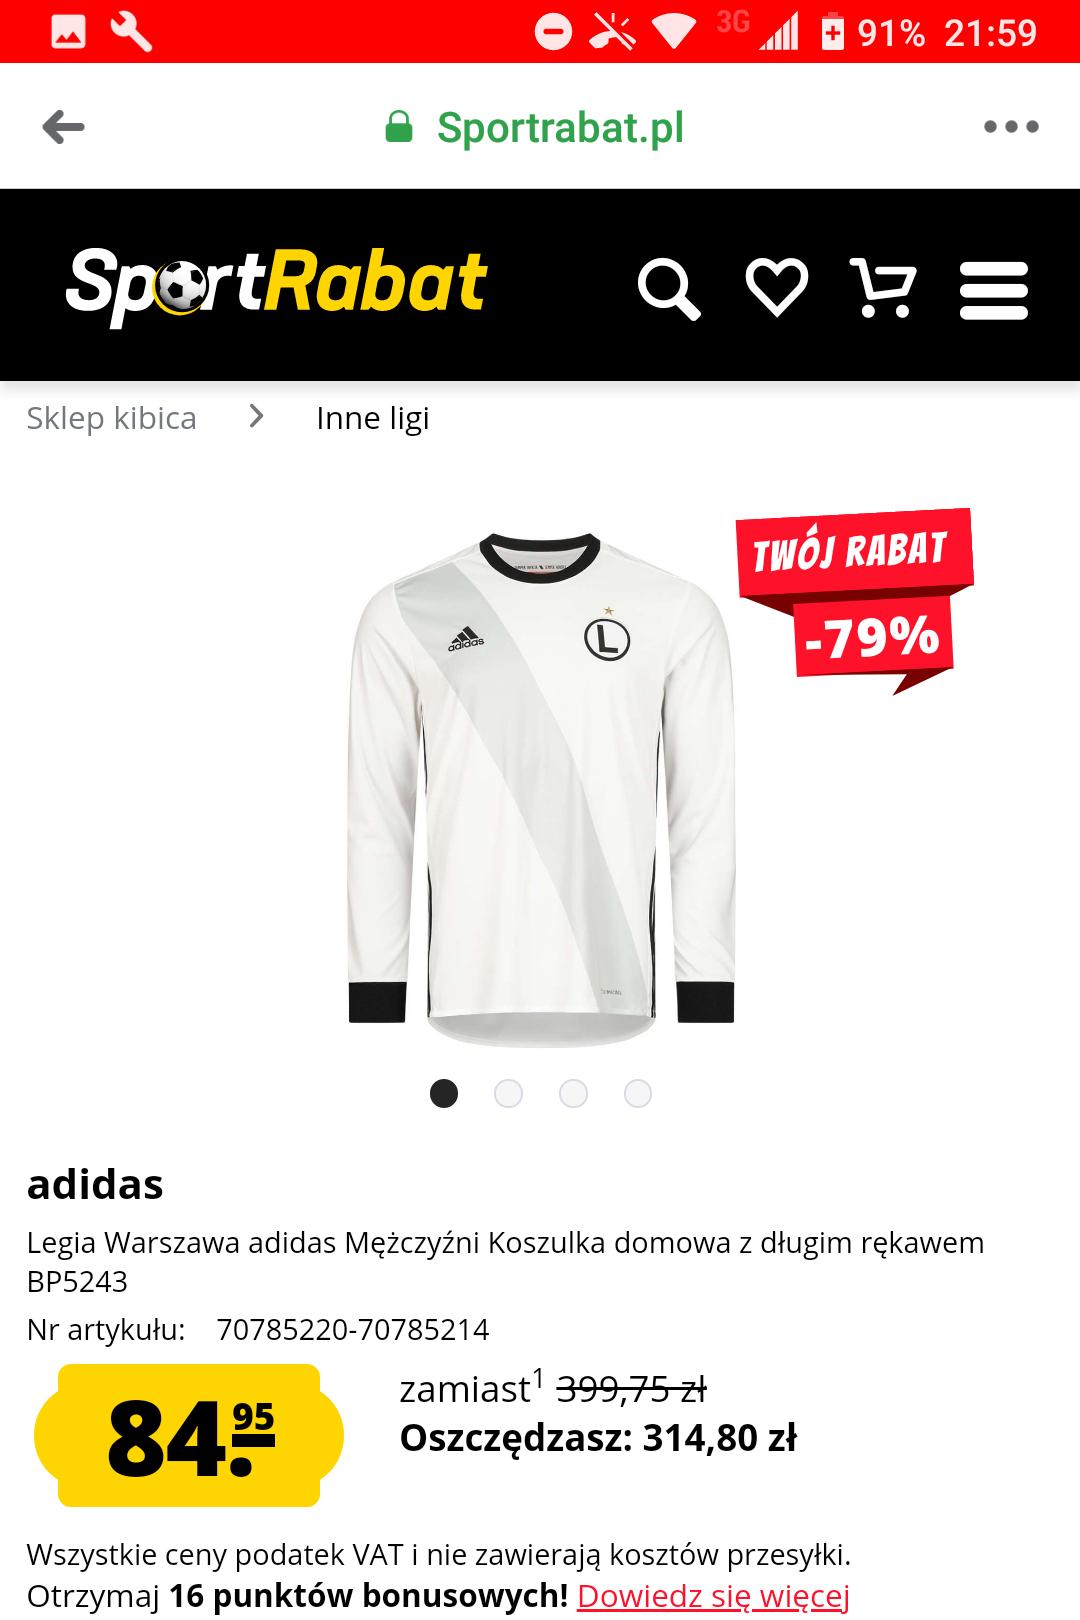 Koszulka Mistrza Polski Ekstraklasy Legia Warszawa